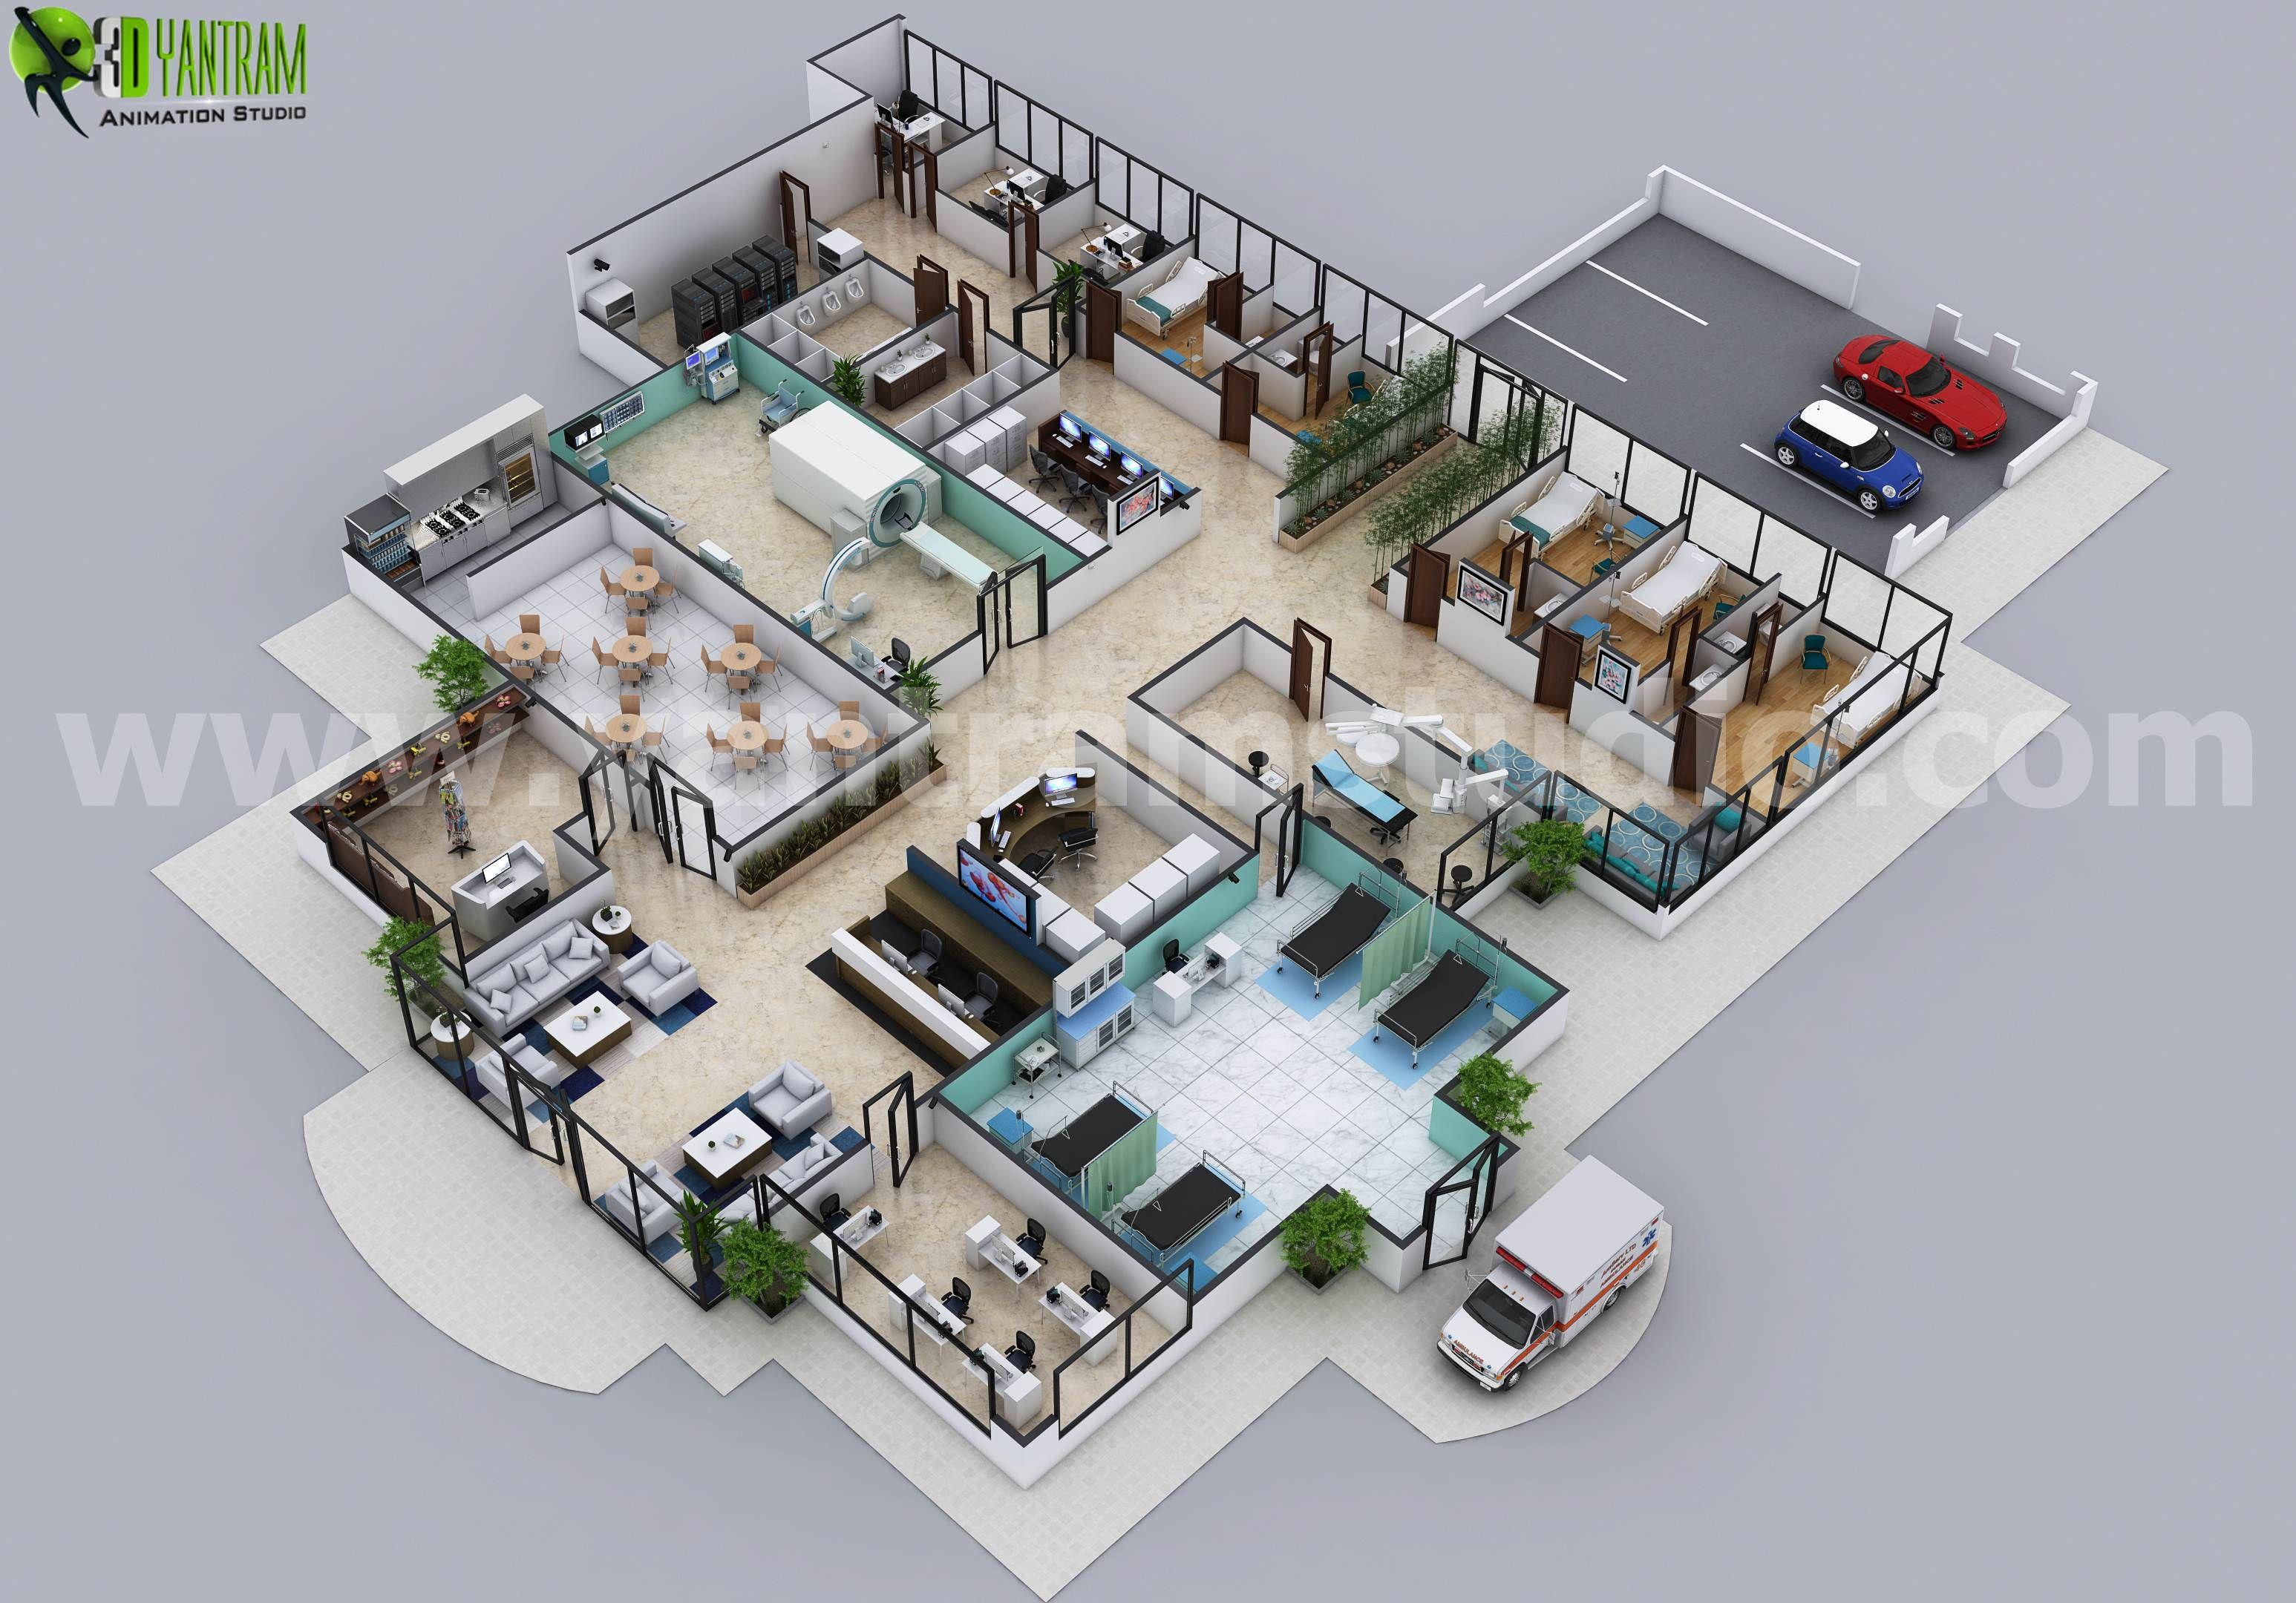 Hospital Floor Plan Concept Design By Yantram Architectural